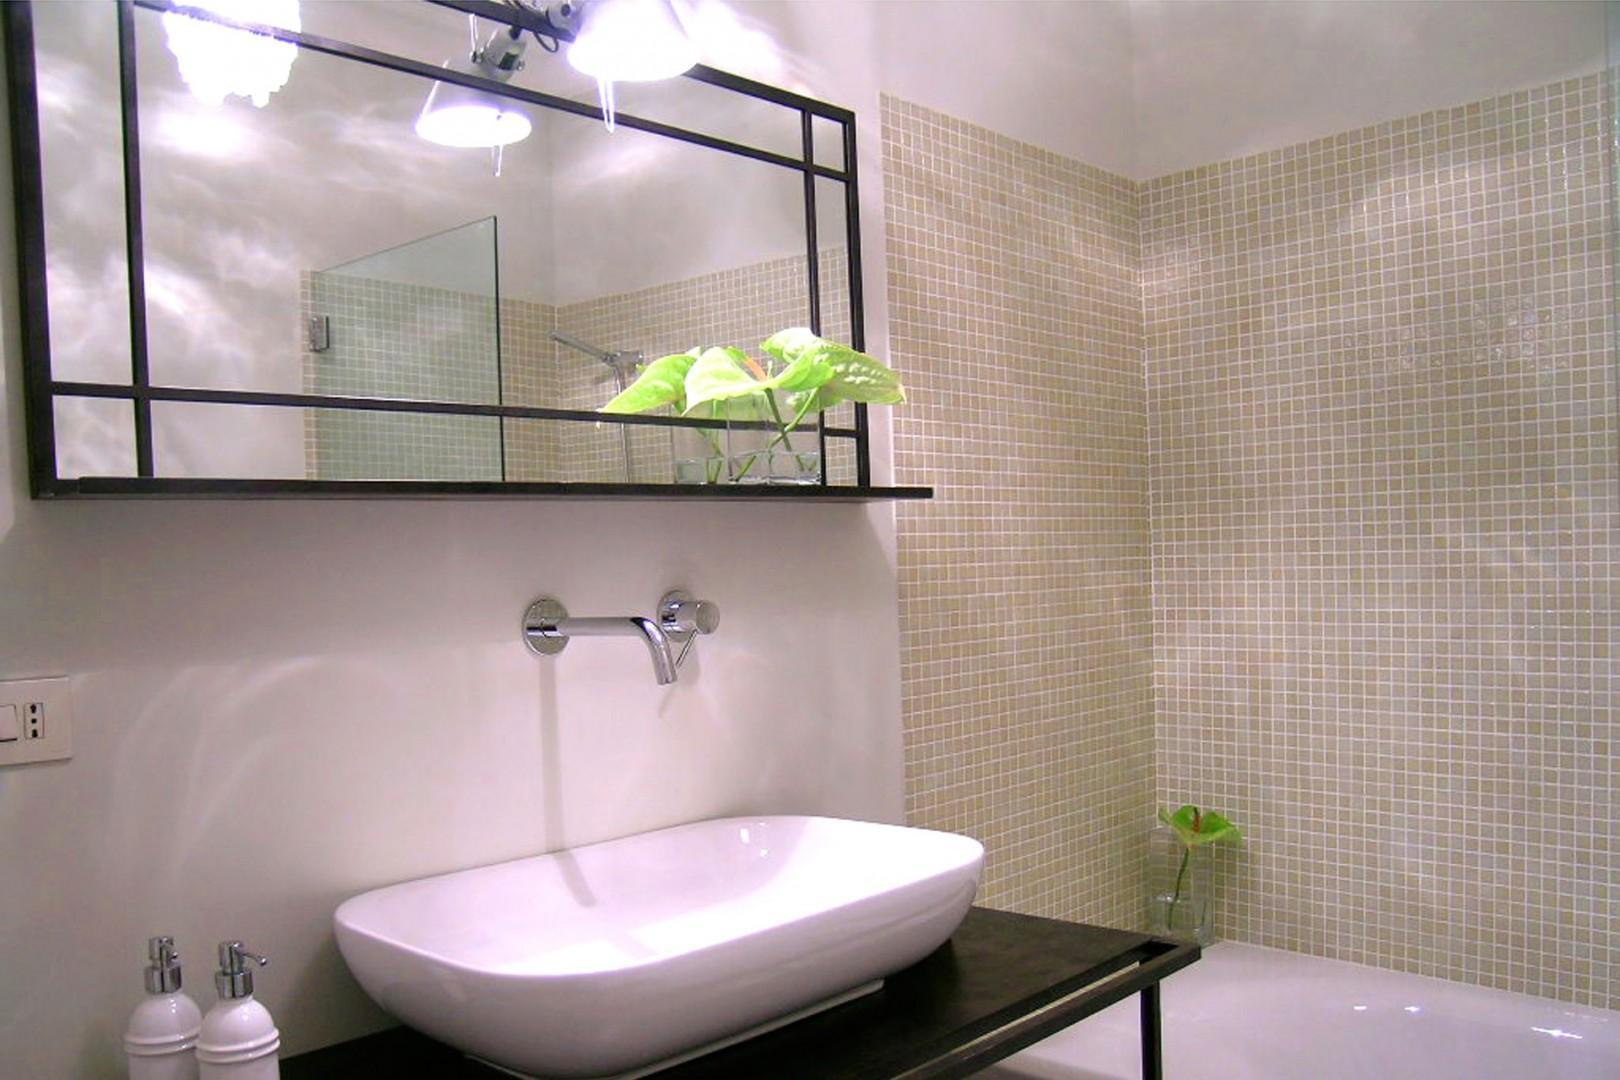 Pale sage colored tiles line the large bathtub walls of the en suite bathroom of bedroom 1.